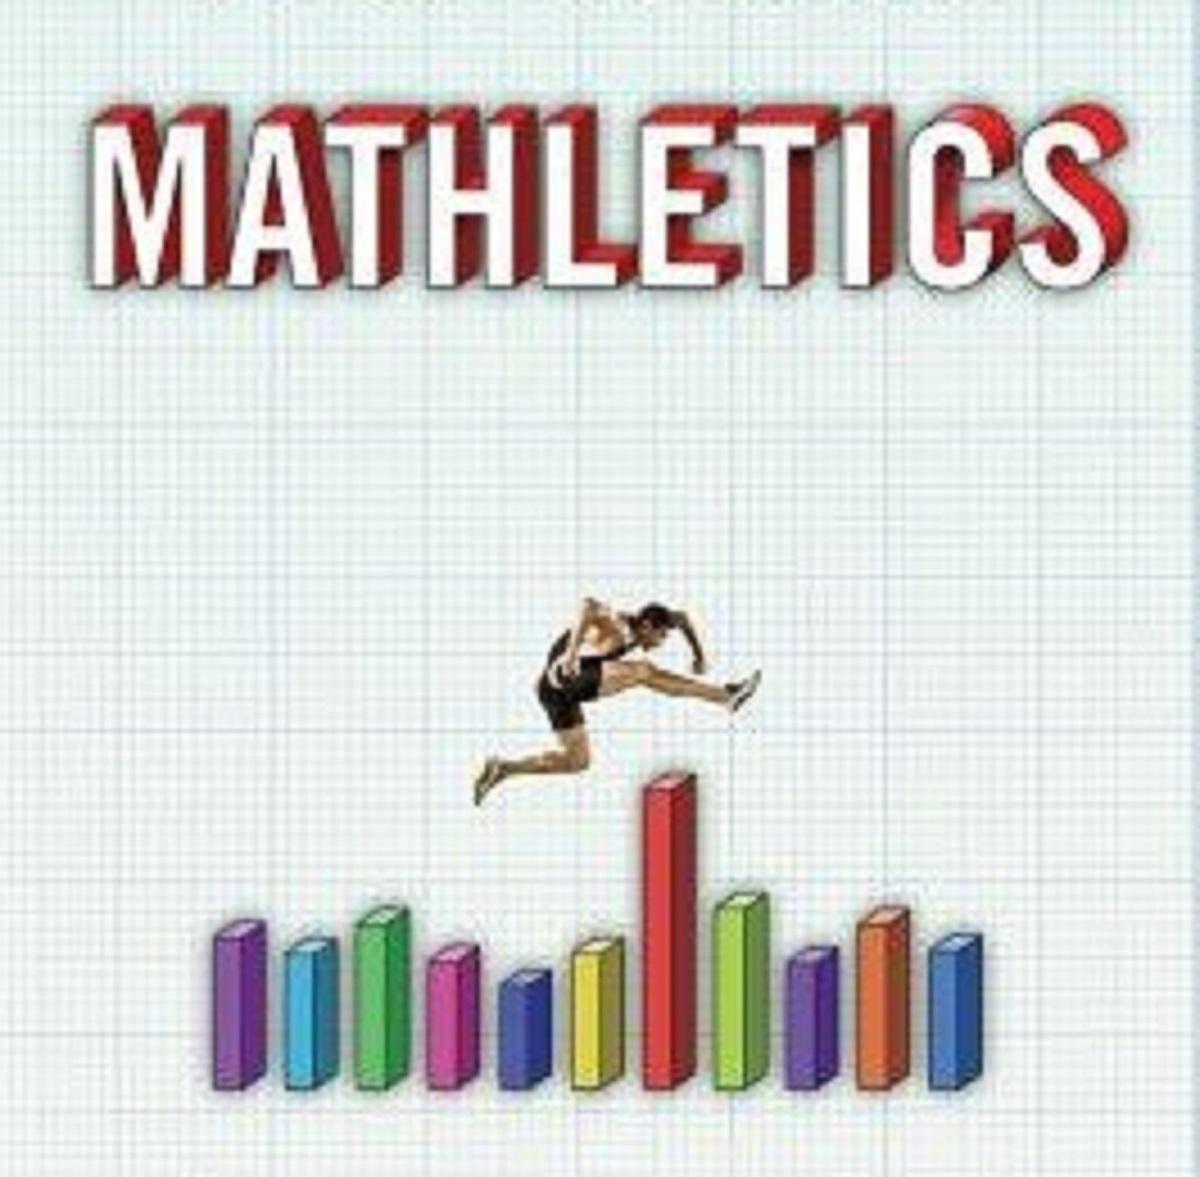 Mathletics by John Barrow